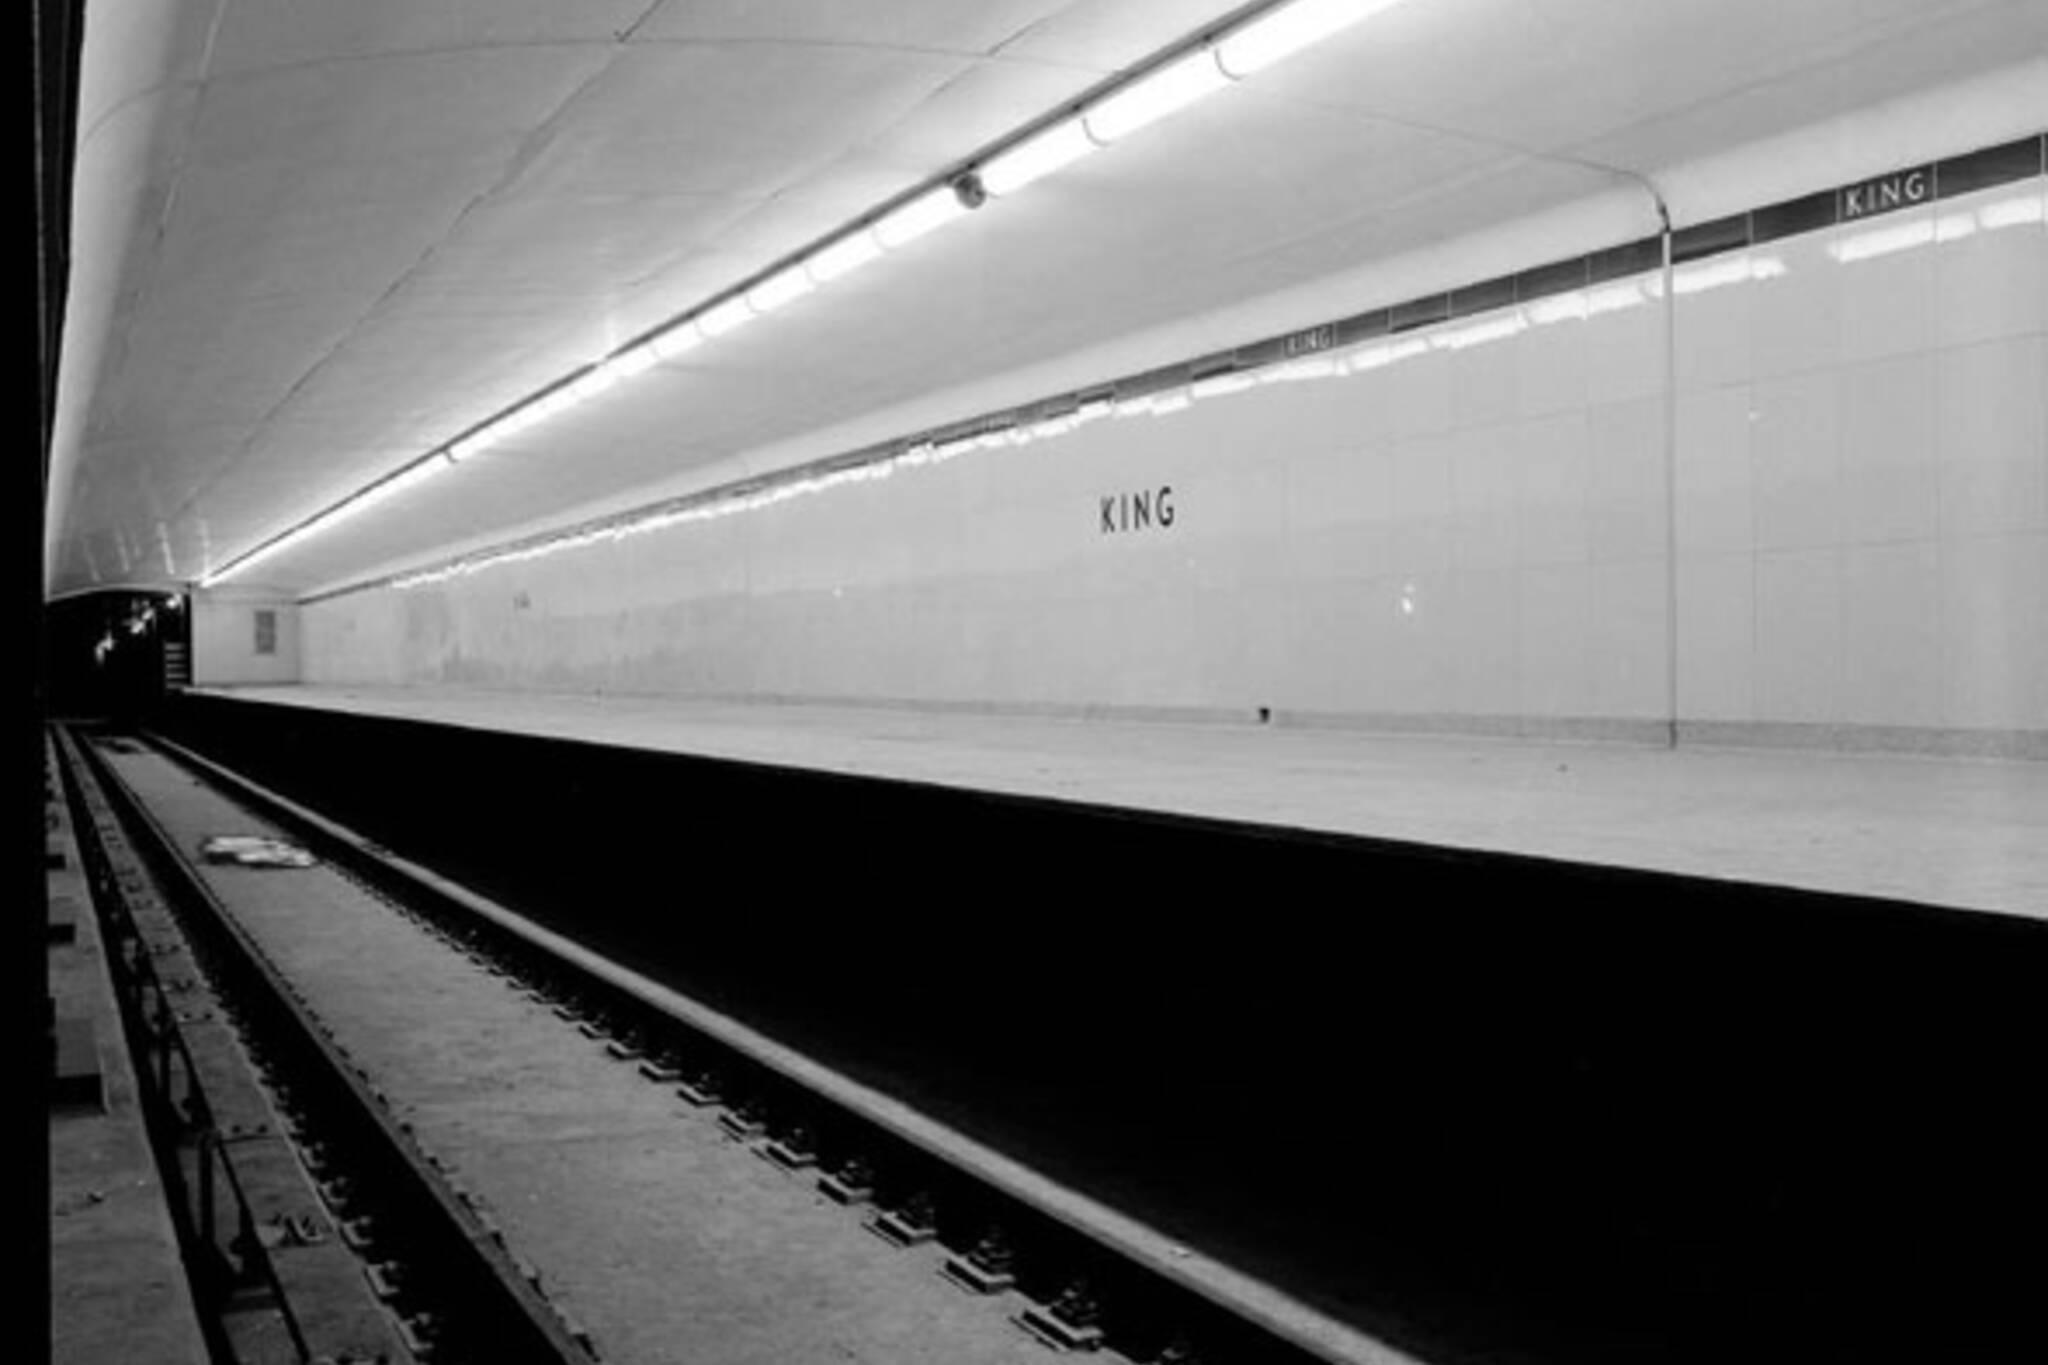 toronto king station